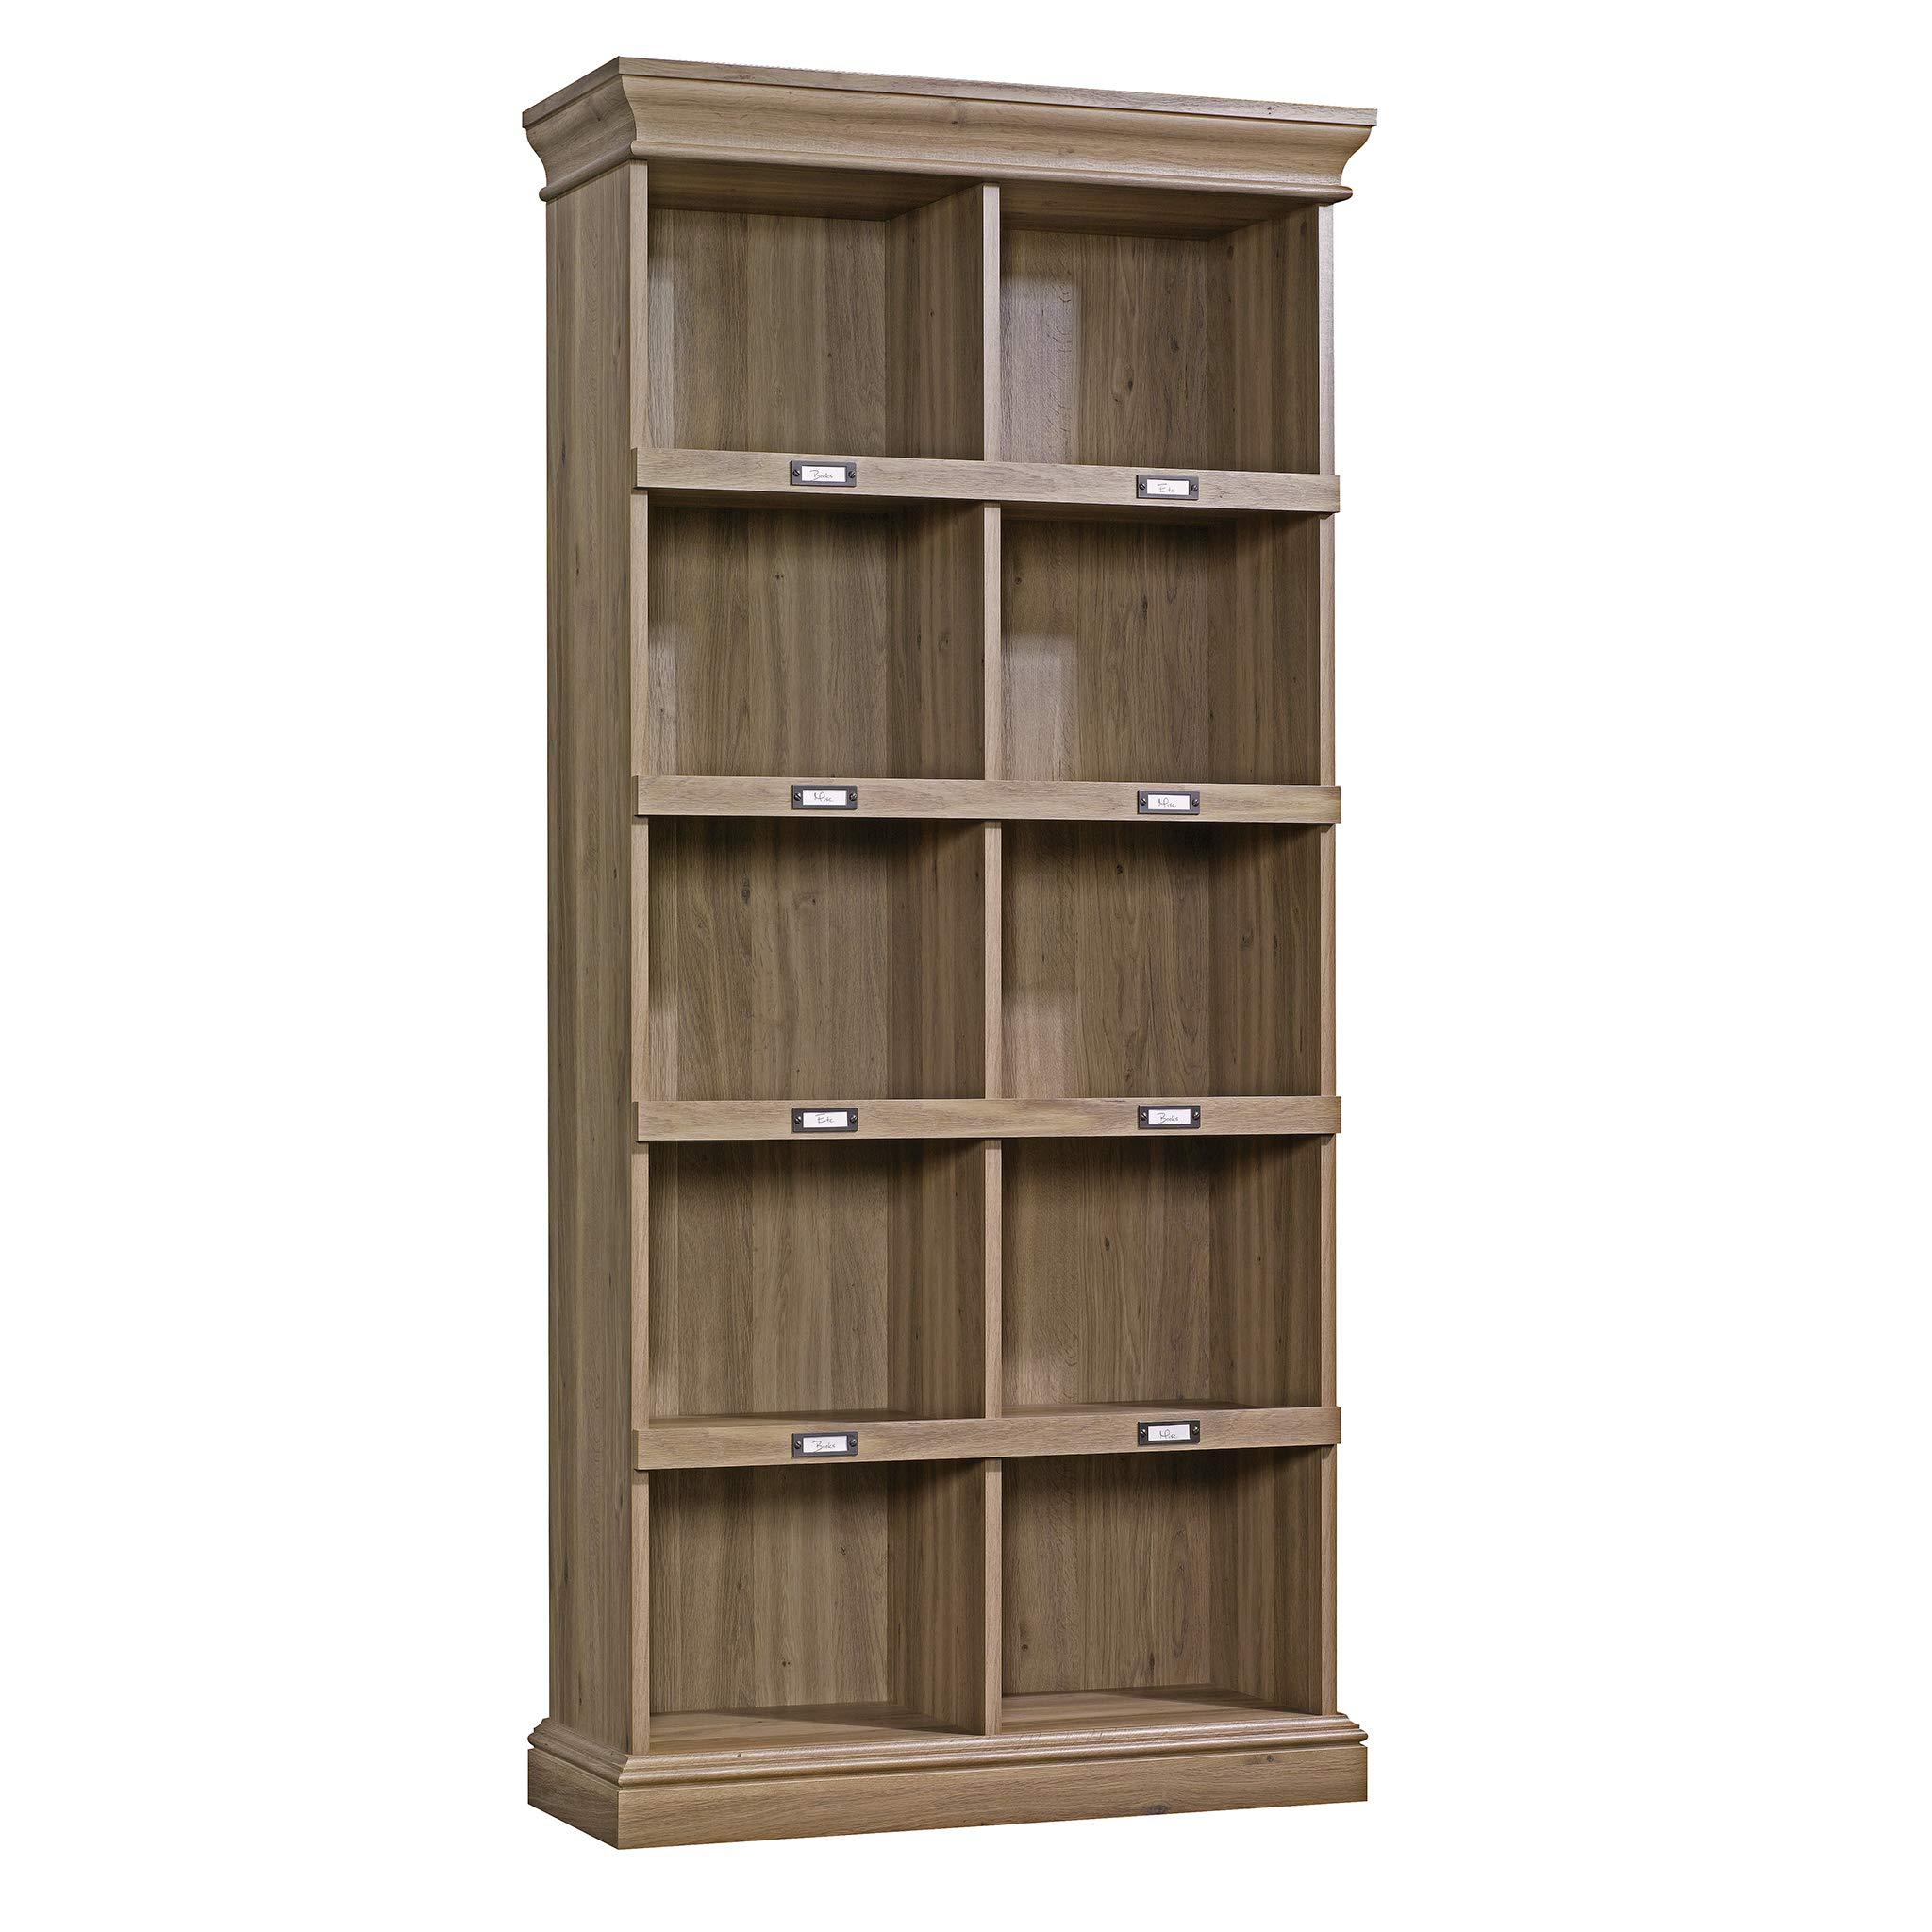 Sauder 414108 Barrister Lane Bookcase, L: 35.55'' x W: 13.50'' x H: 75.04'', Salt Oak finish